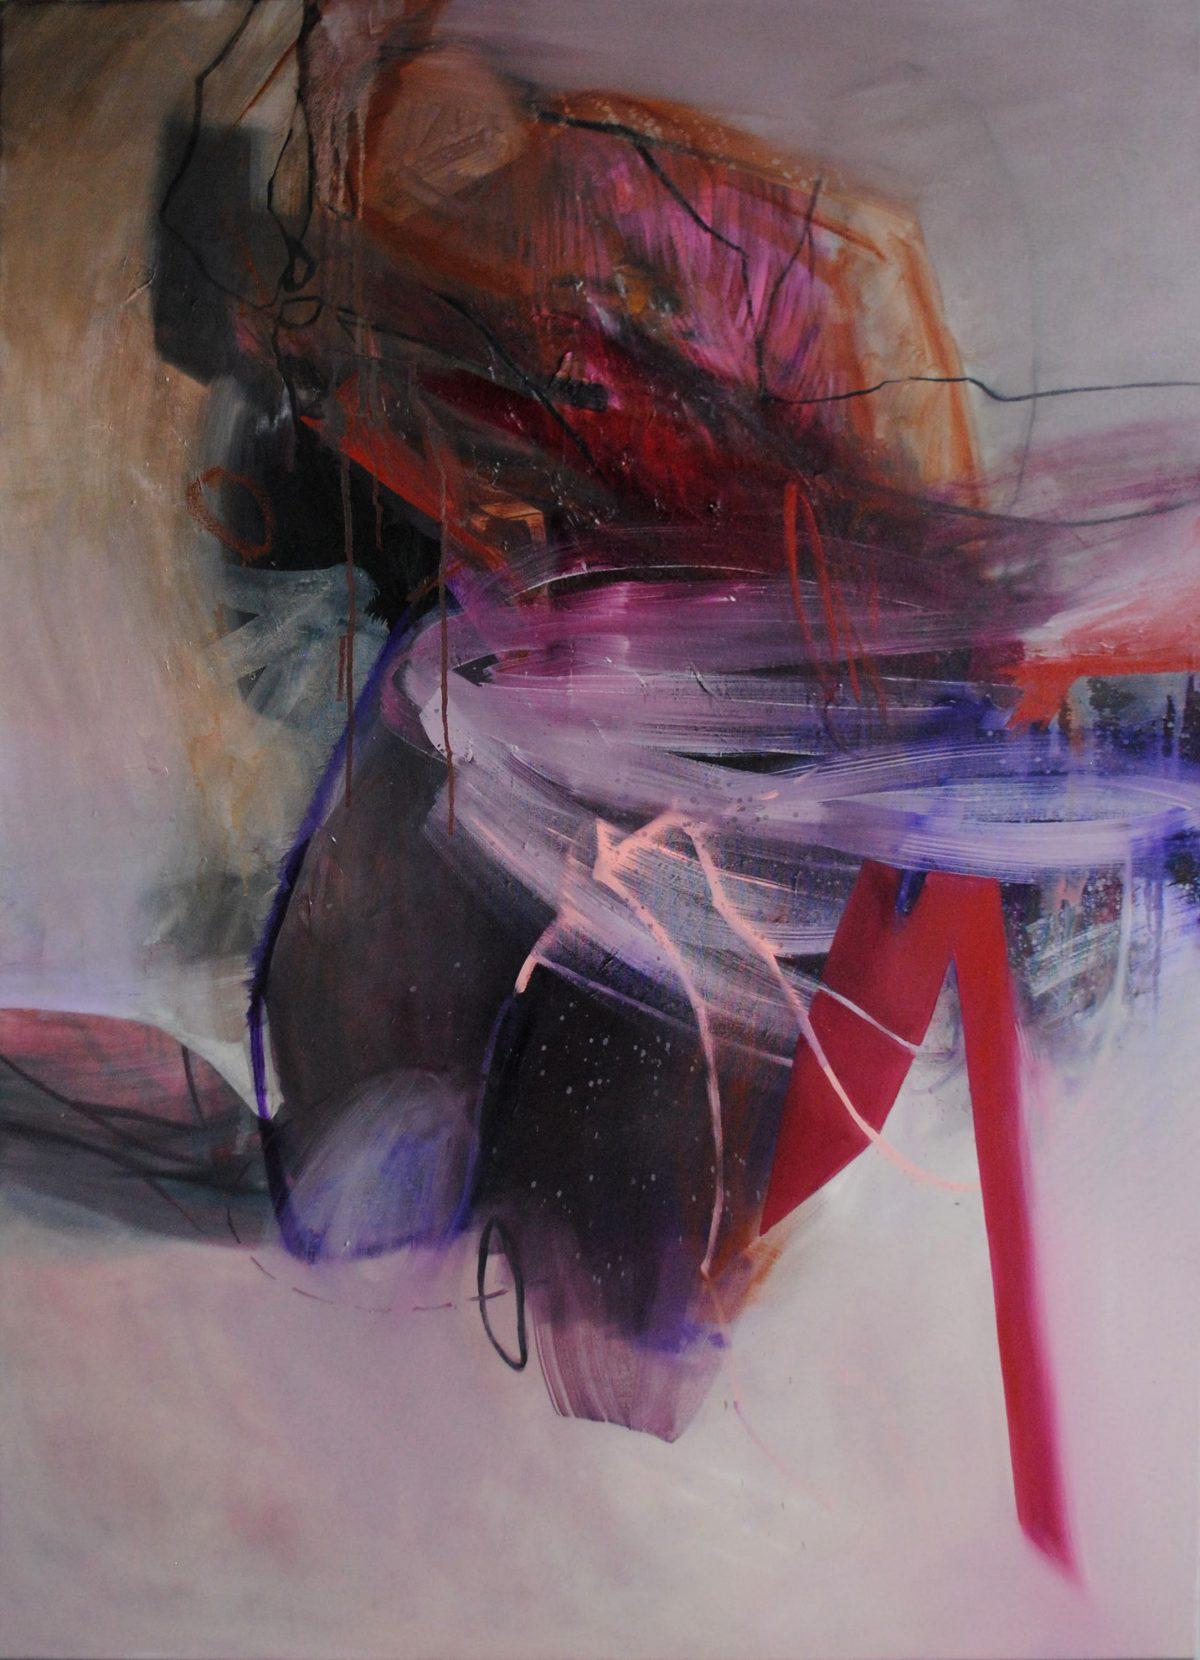 Fragments 6, acrylic and oil on canvas, 2019, 100x150 cm